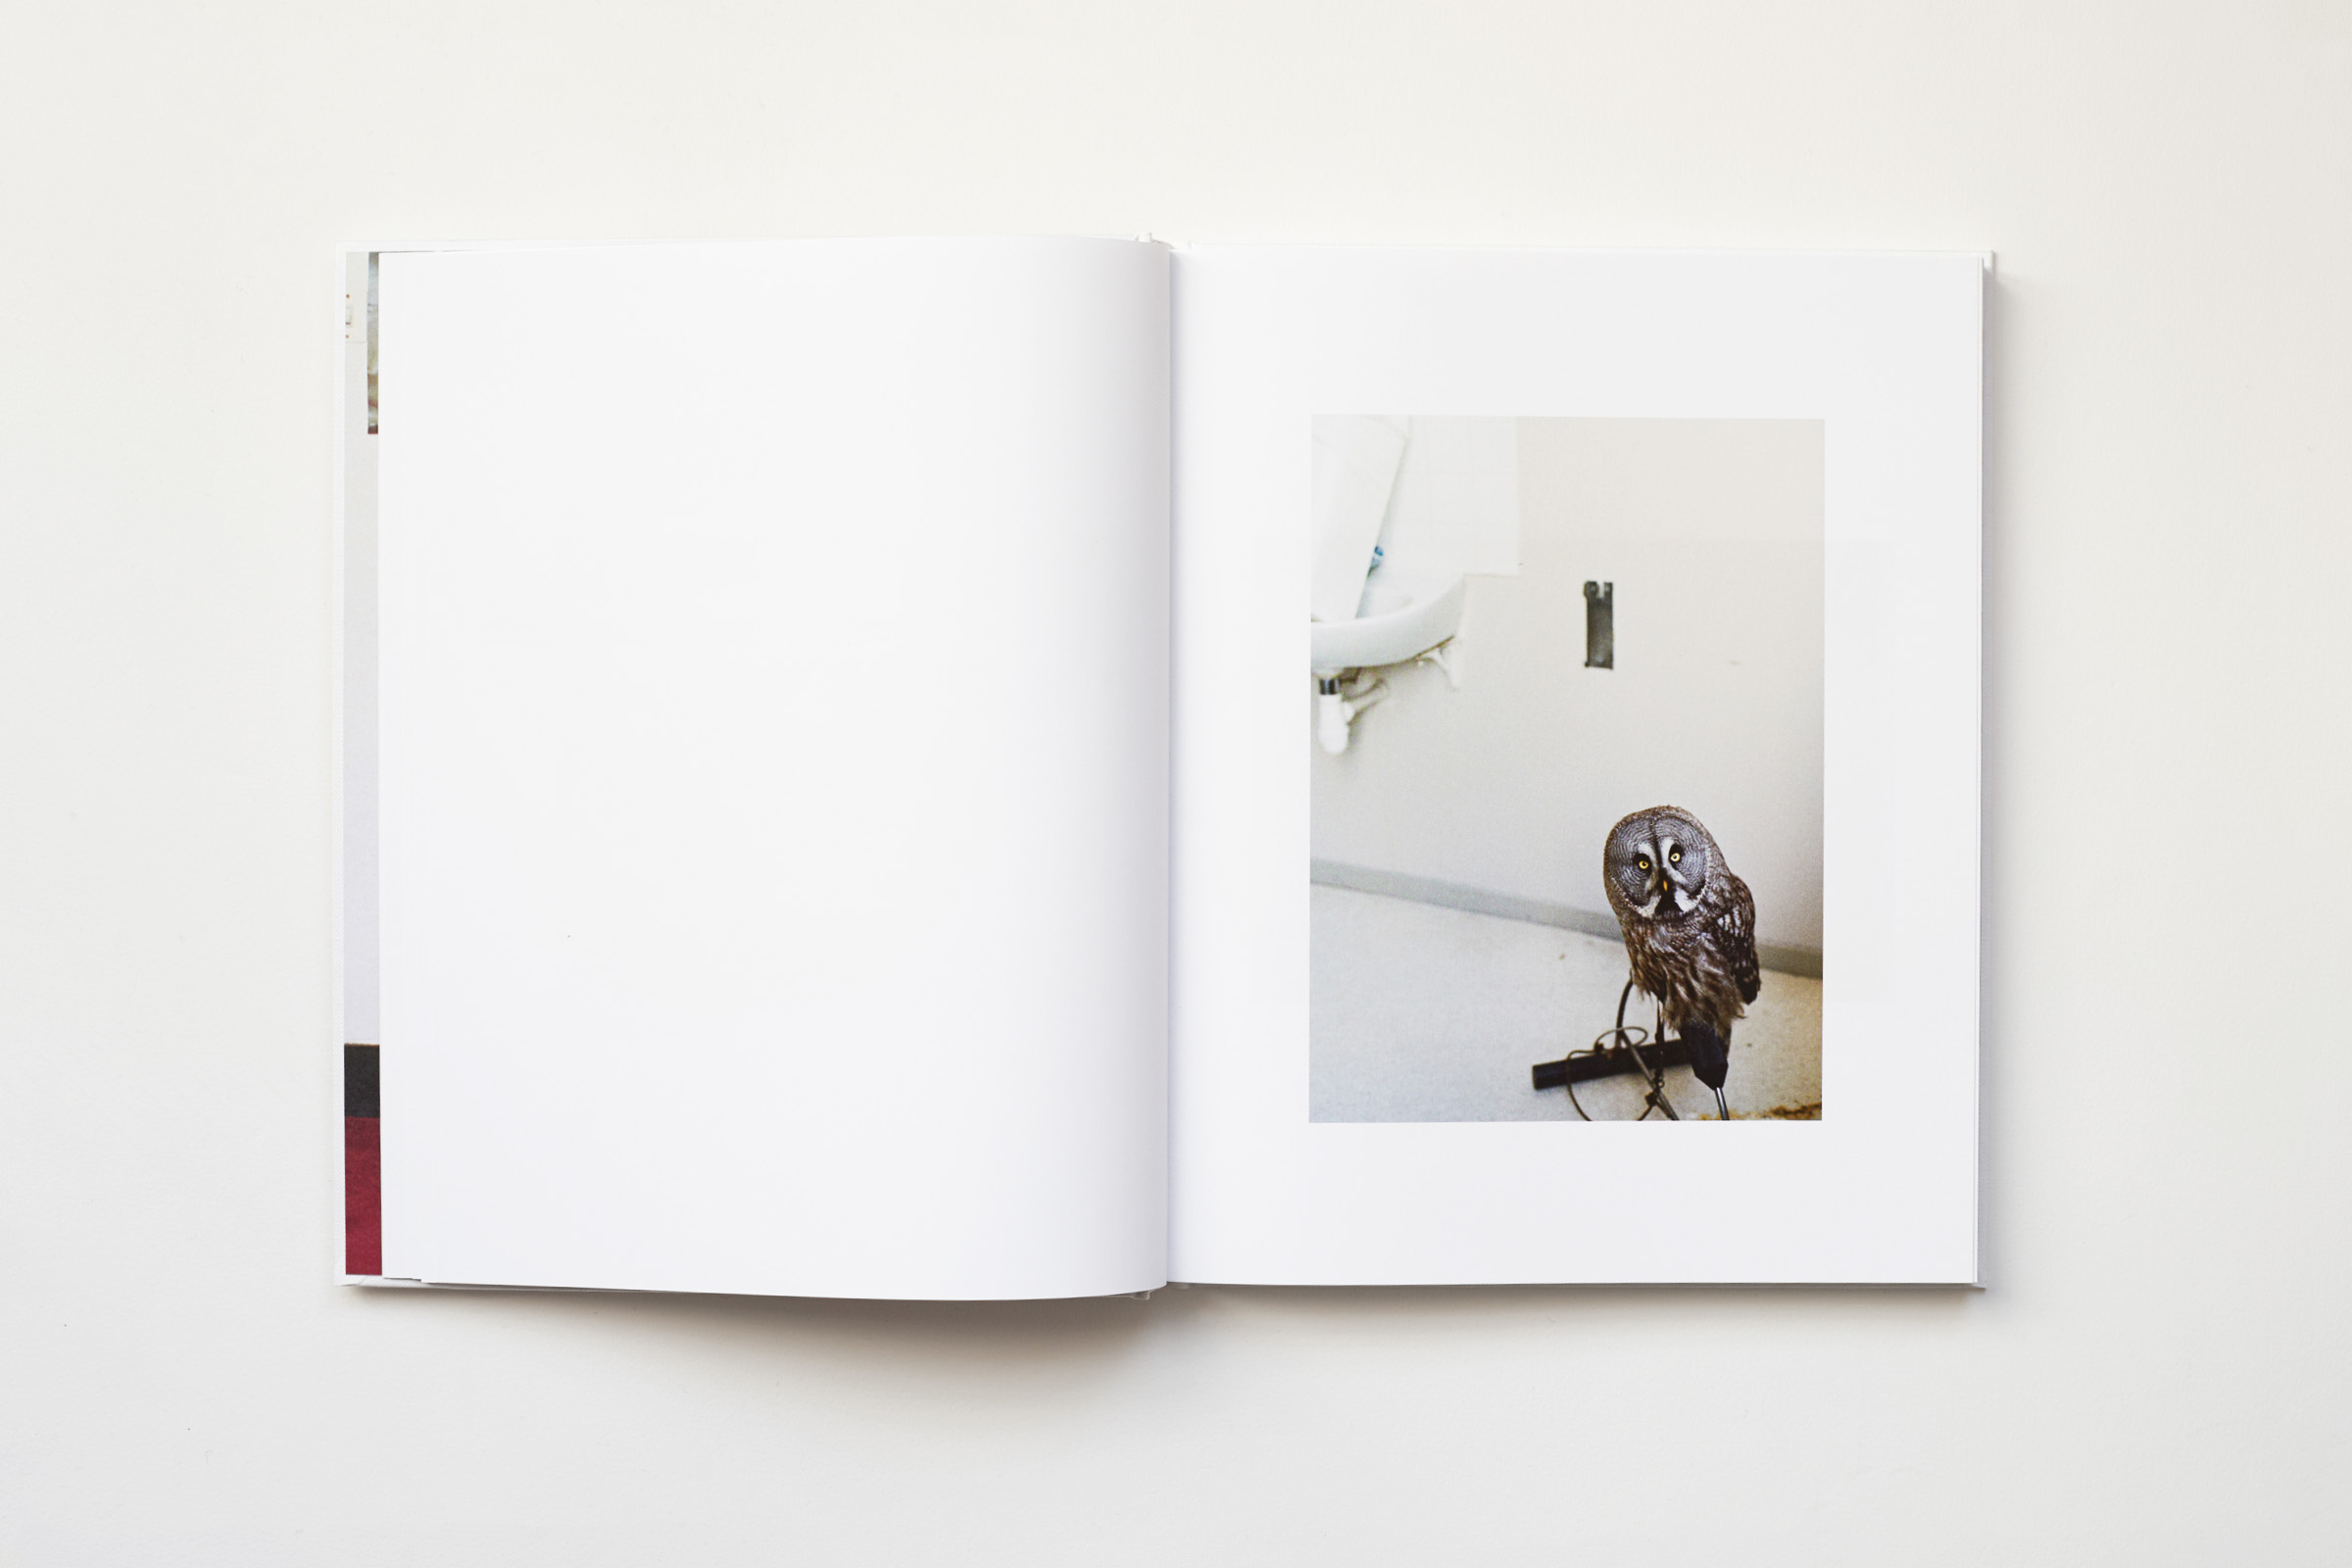 Estelle Hanania Gisele Vienne Shelter Press